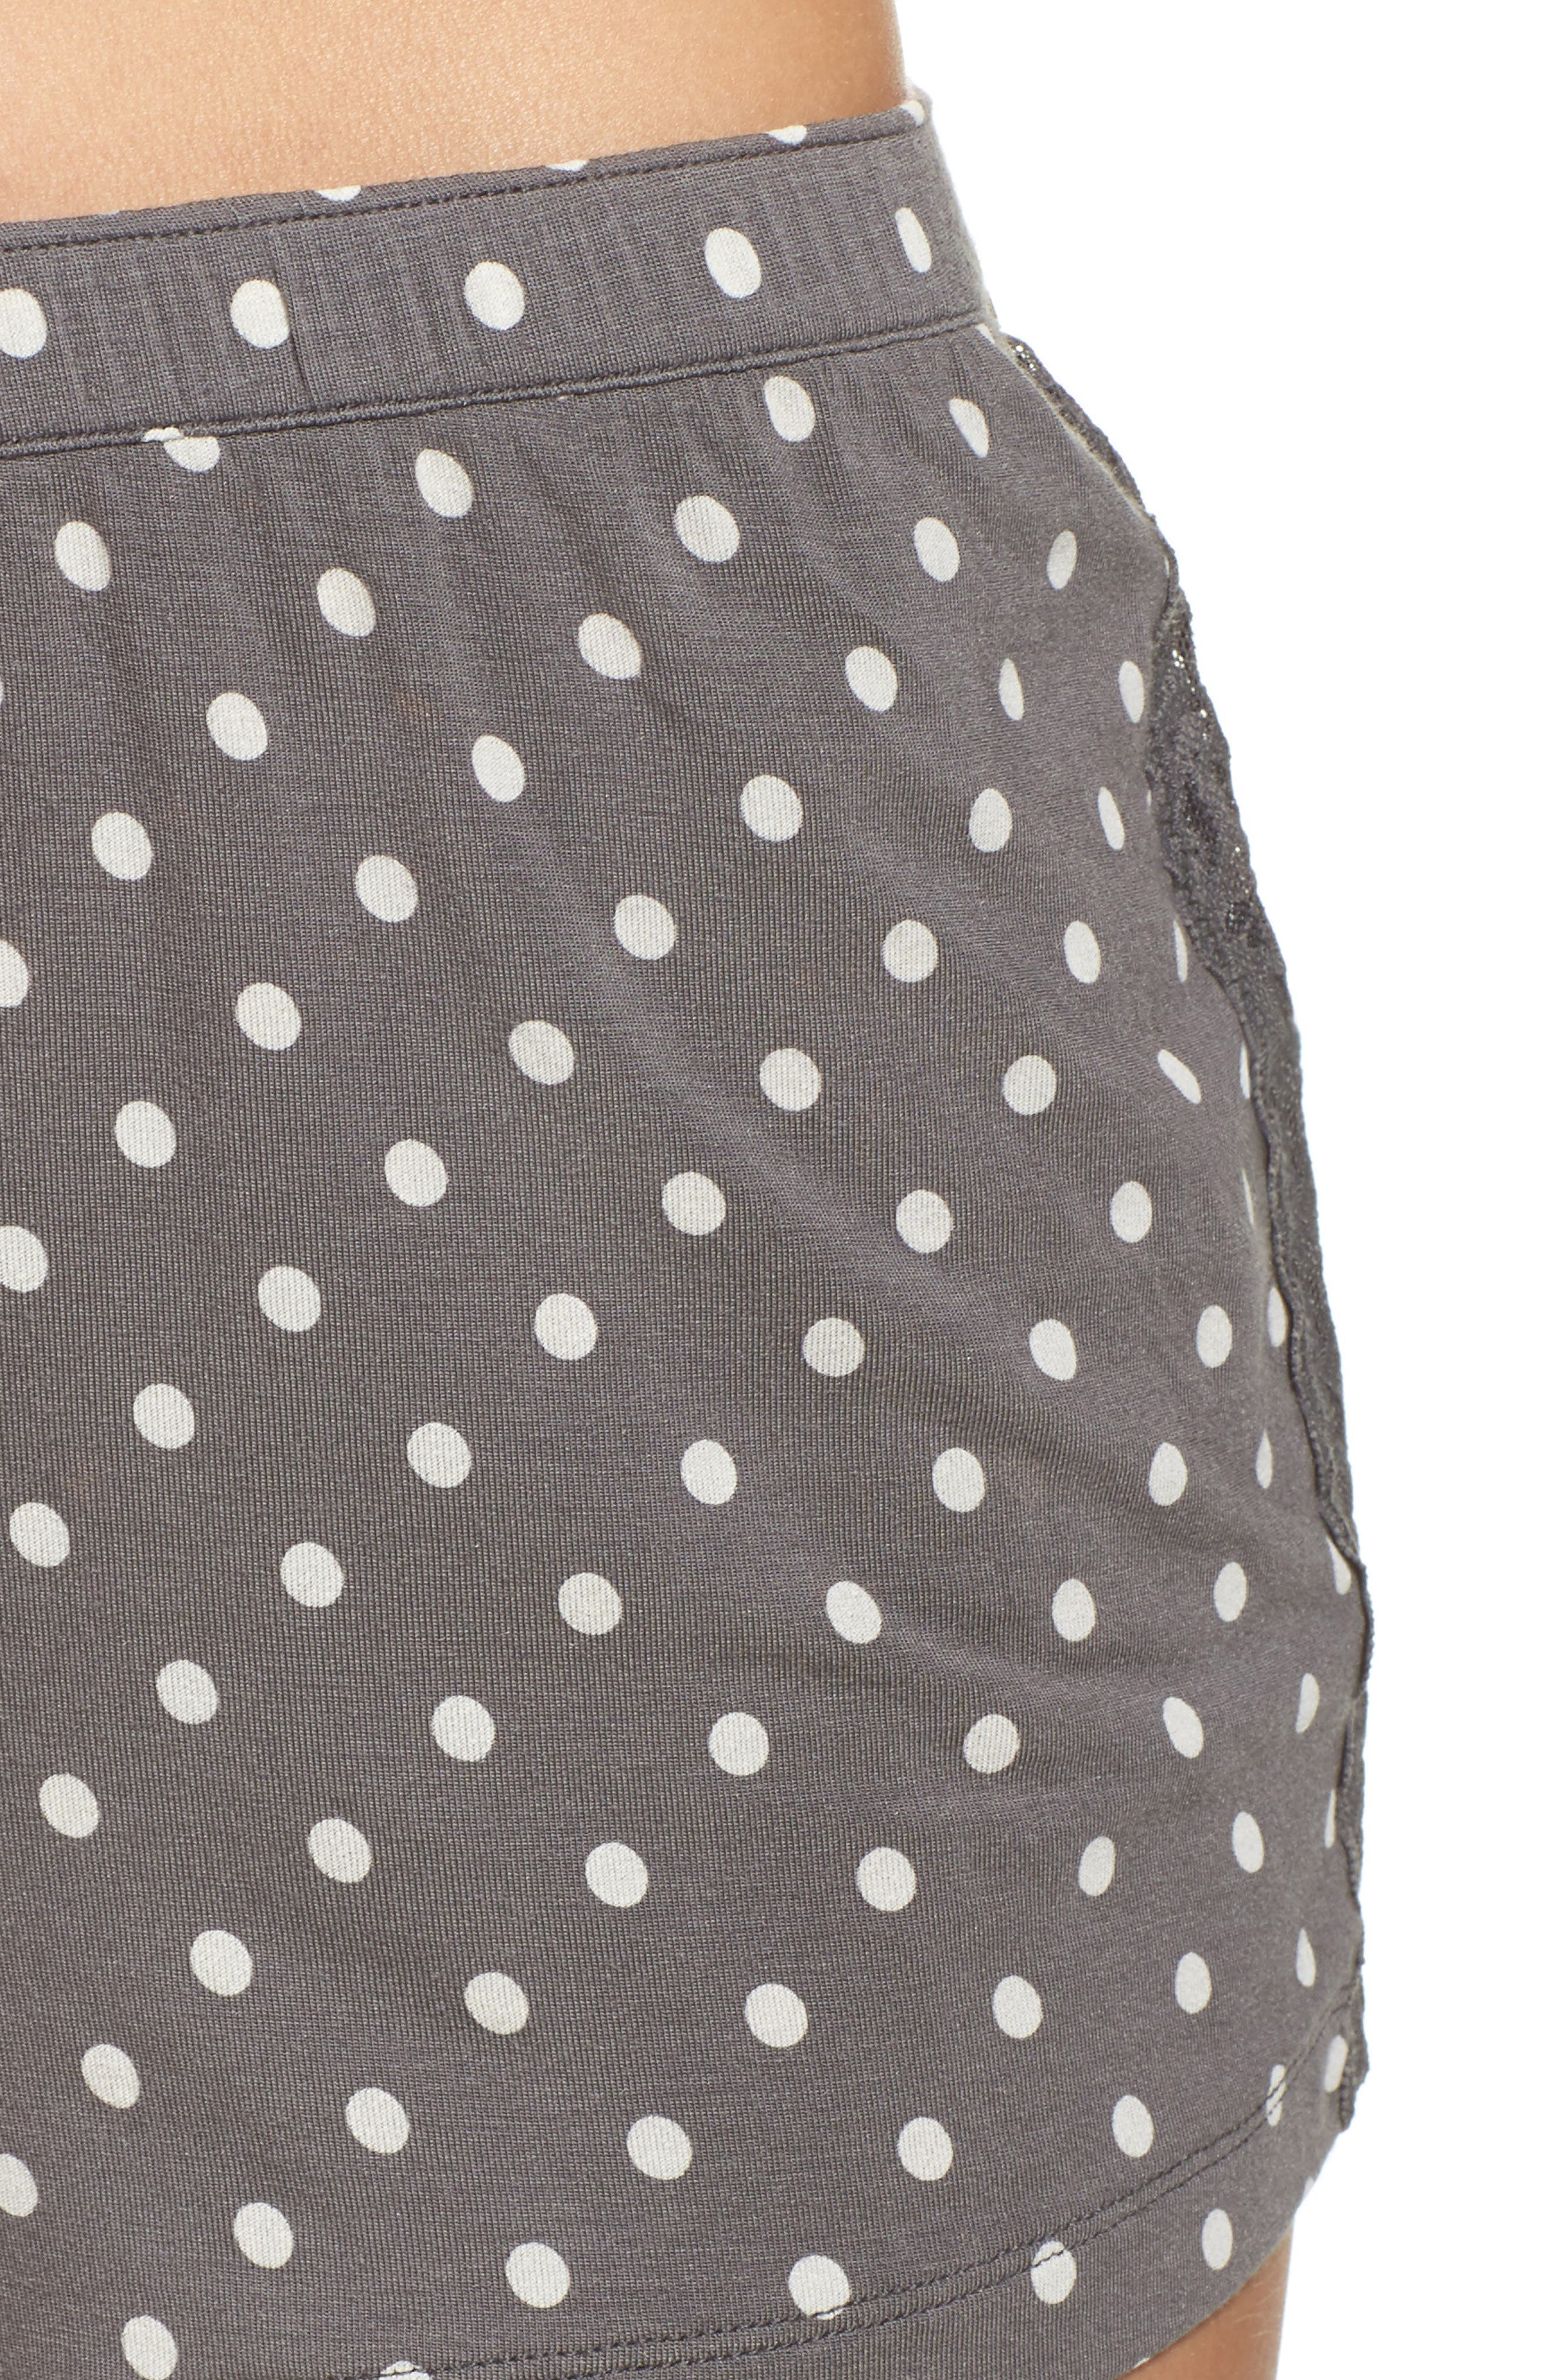 Shorts,                             Alternate thumbnail 8, color,                             Charcoal